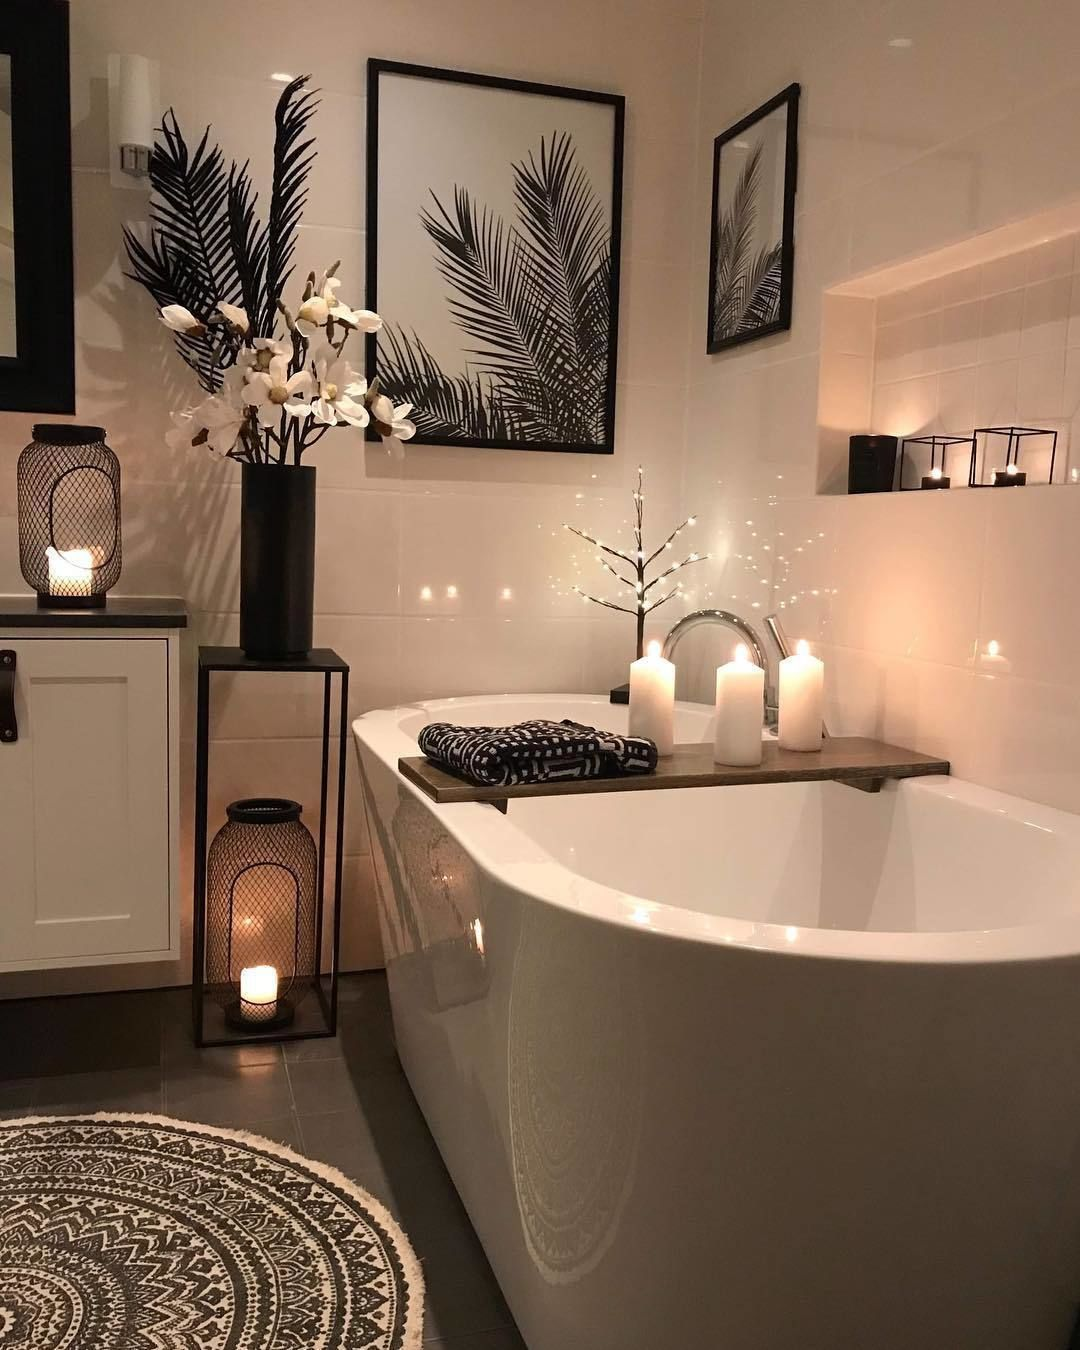 Pin On Bathroom Ideas Home decor bathroom pictures